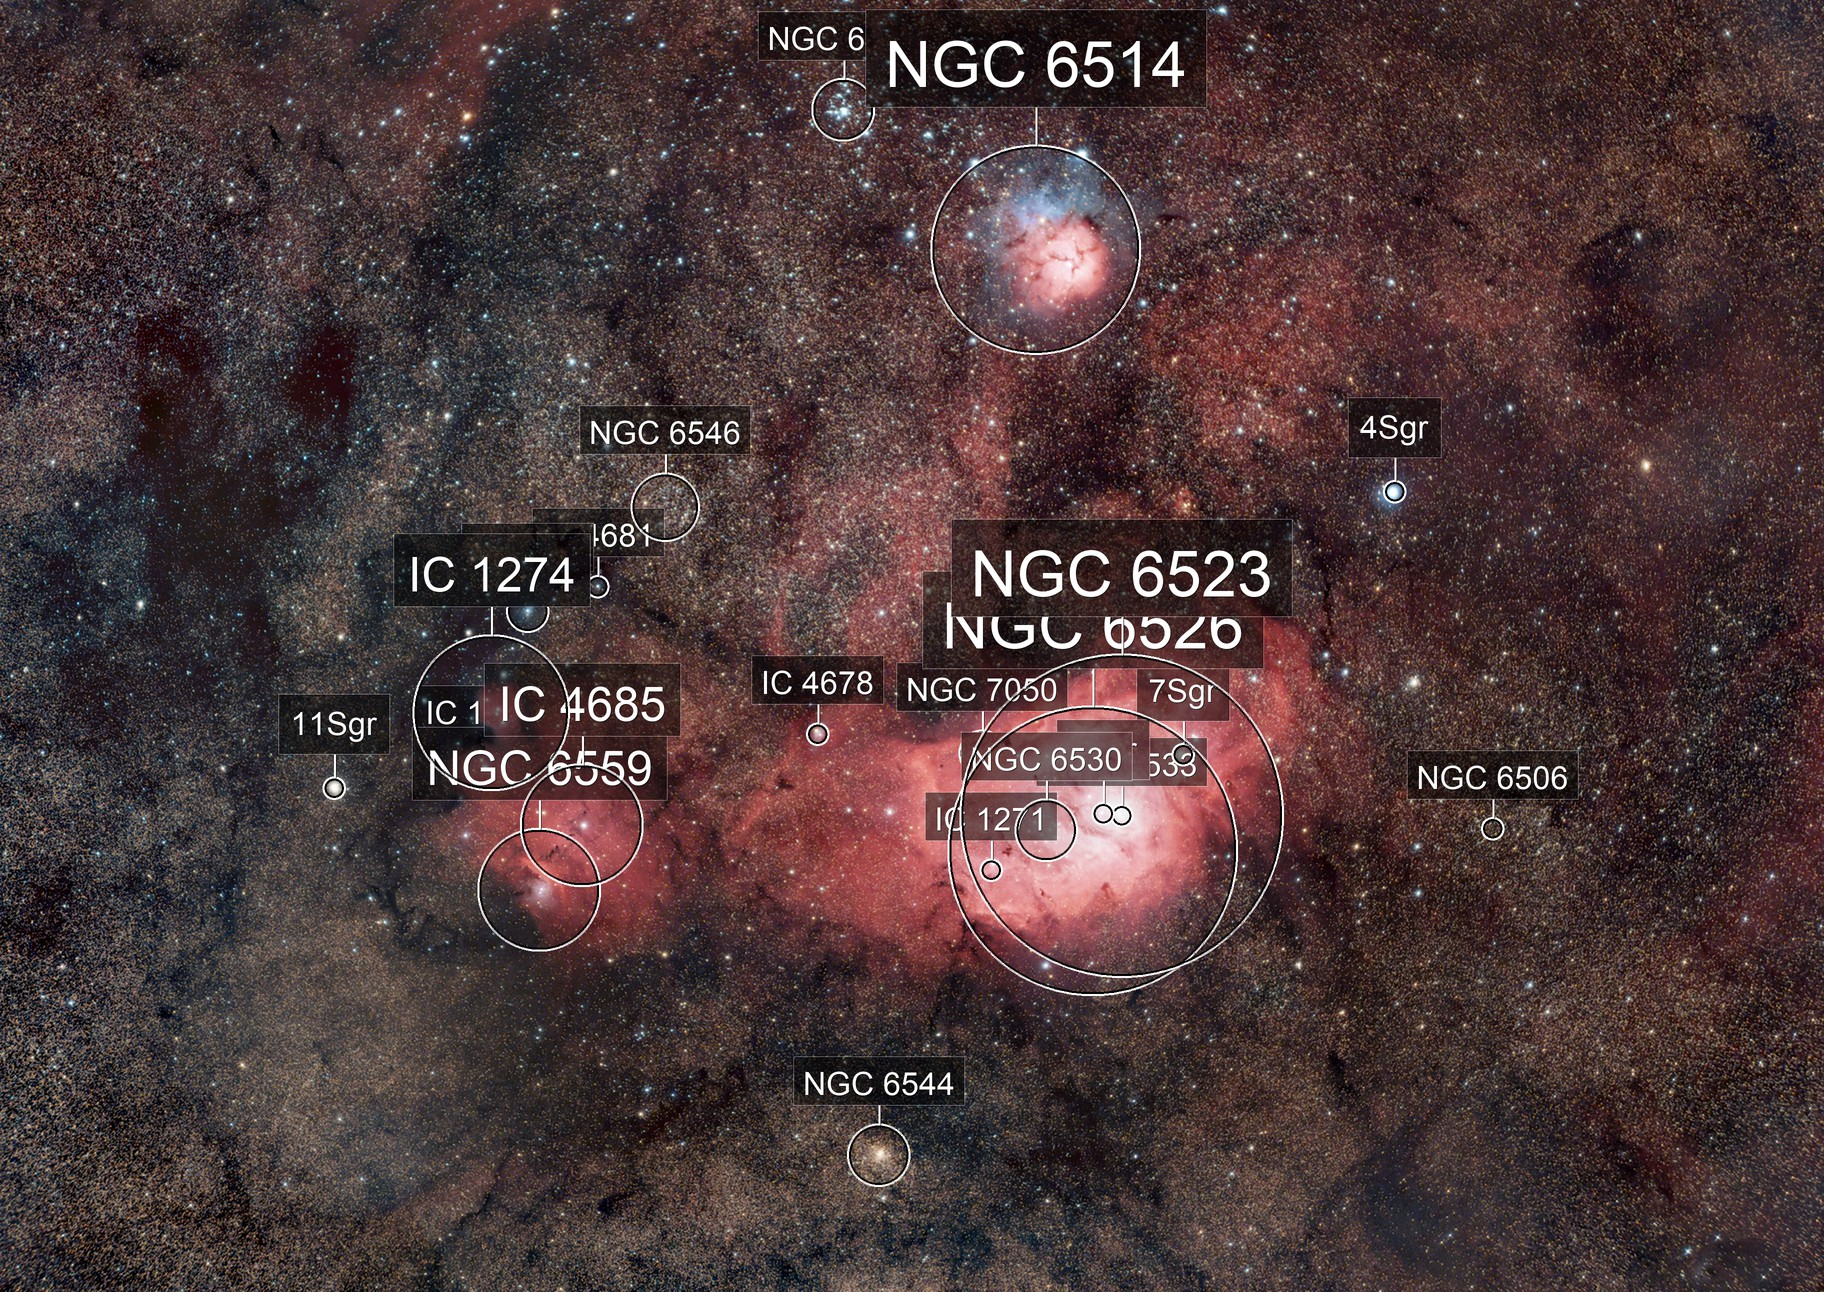 Lagoon & Trifid nebula in an ocean of stars